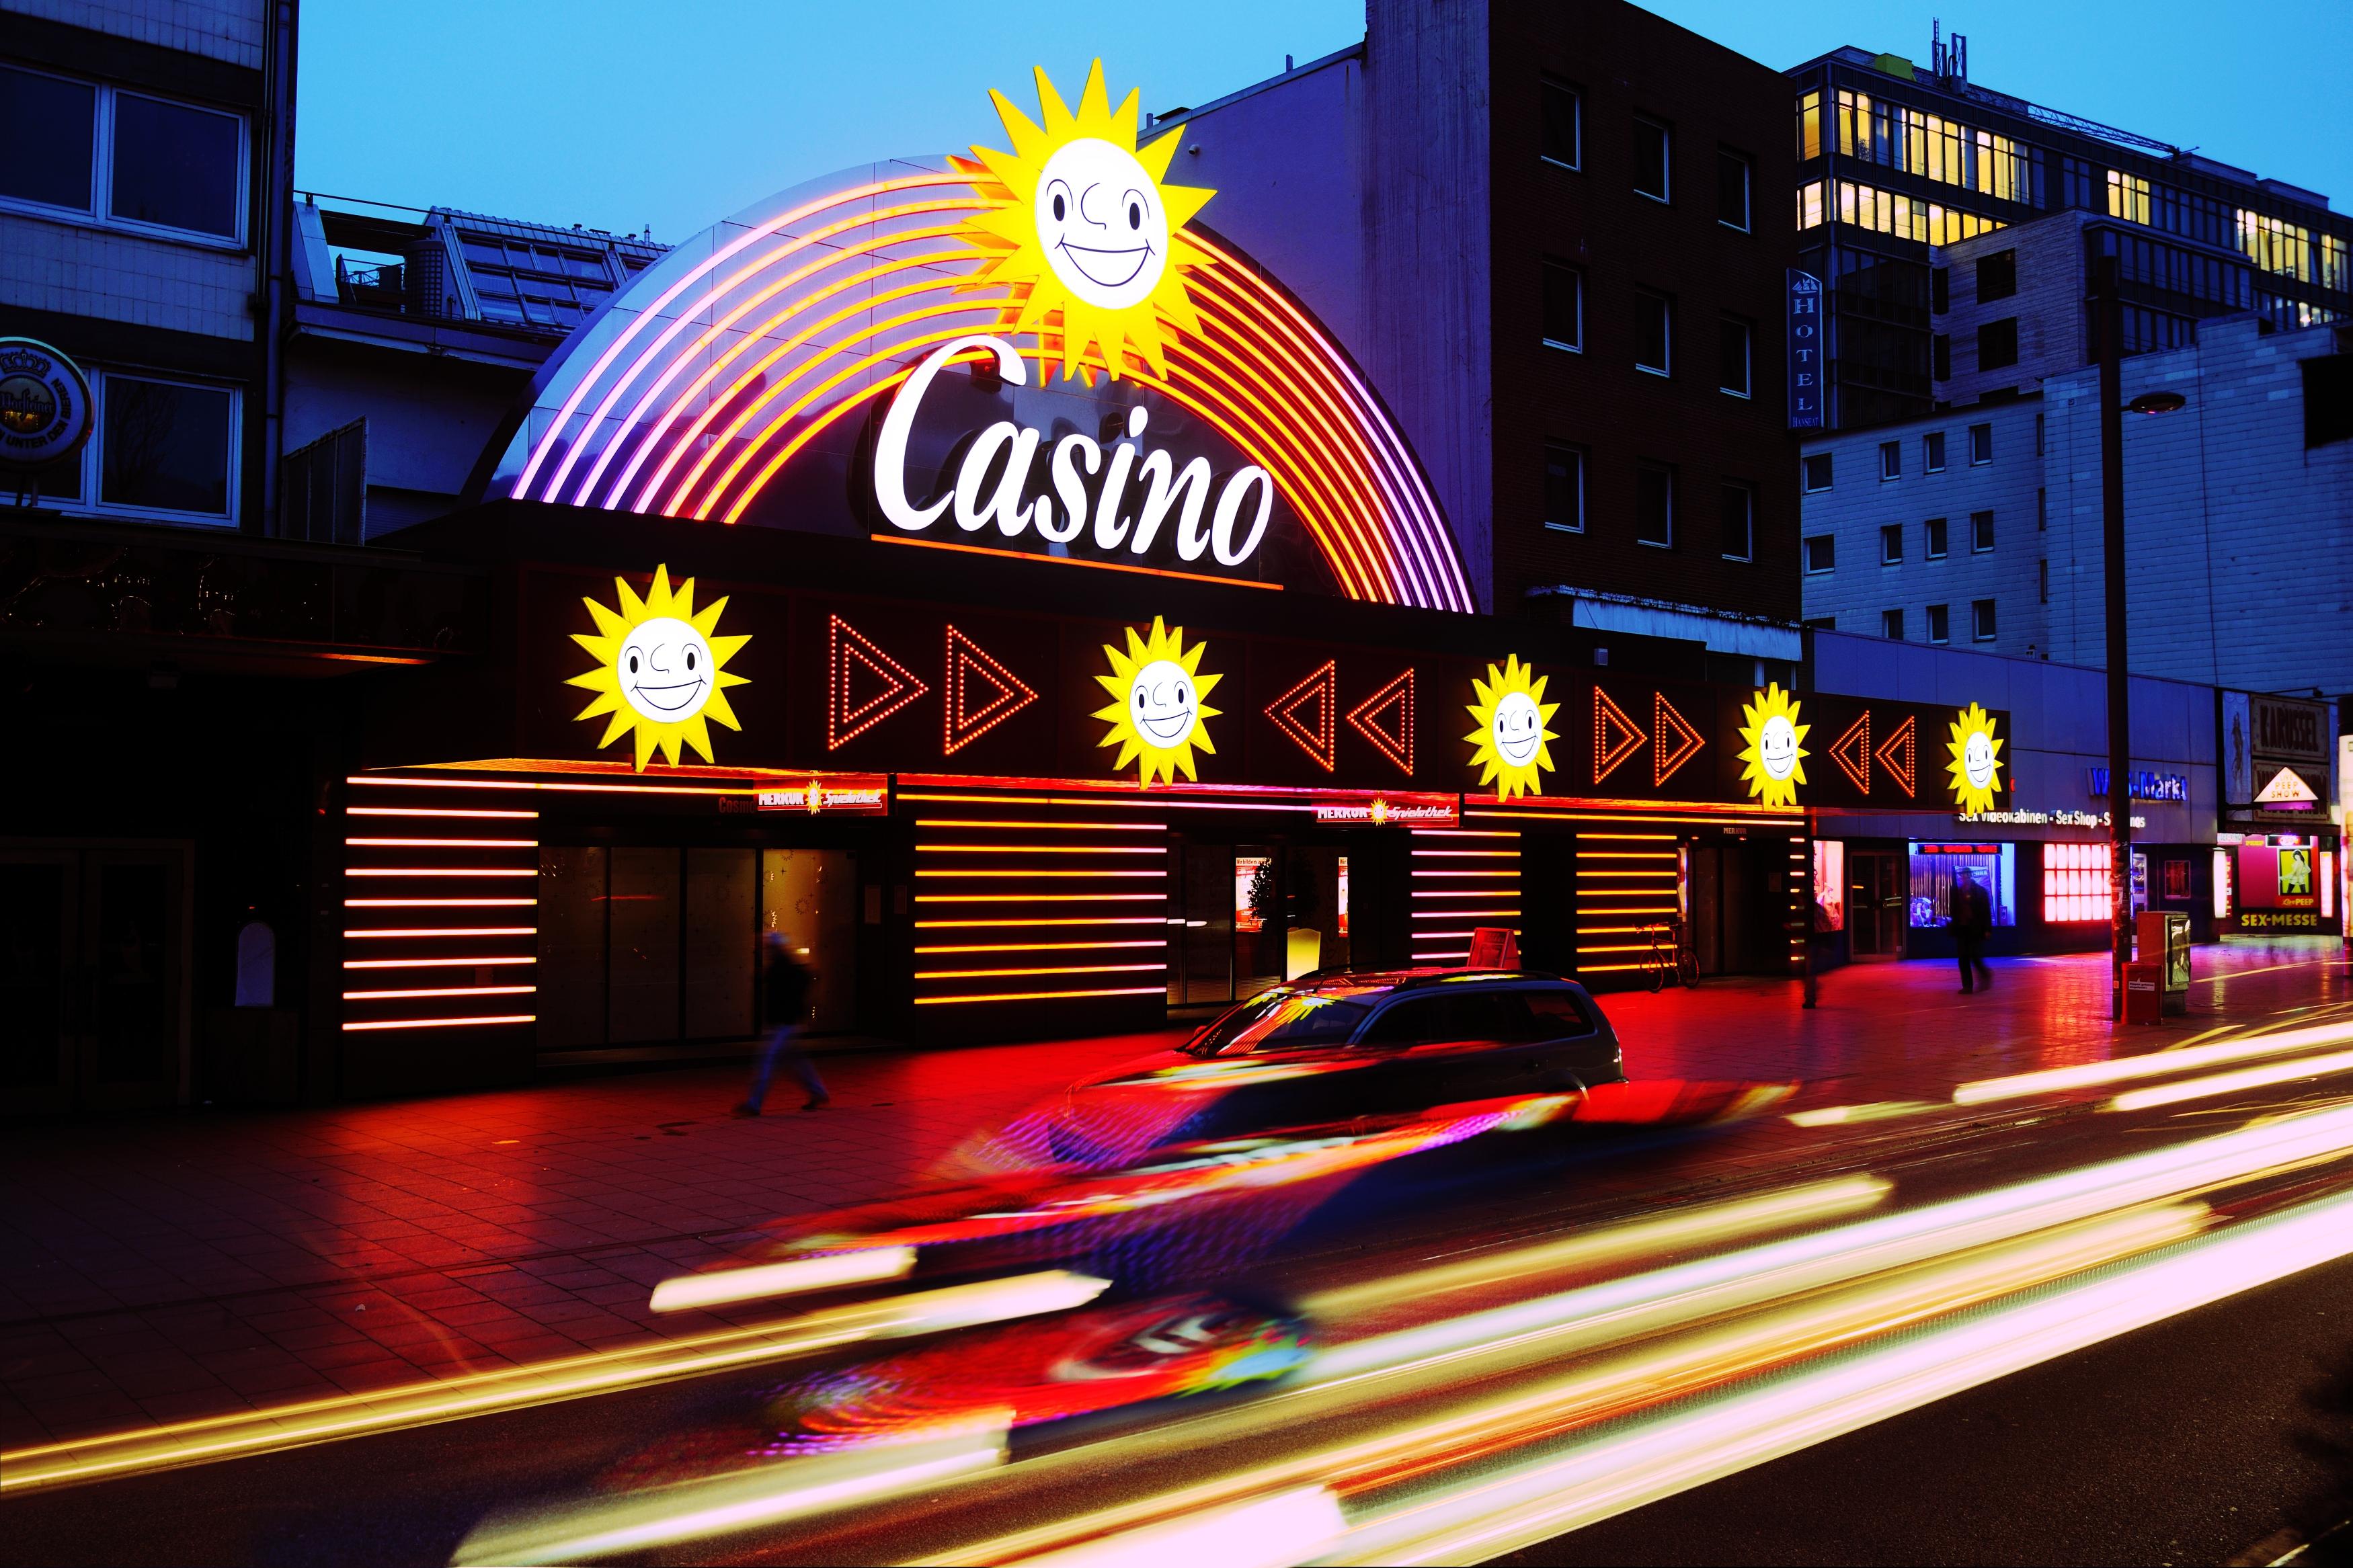 Www.Merkur Casino.Com